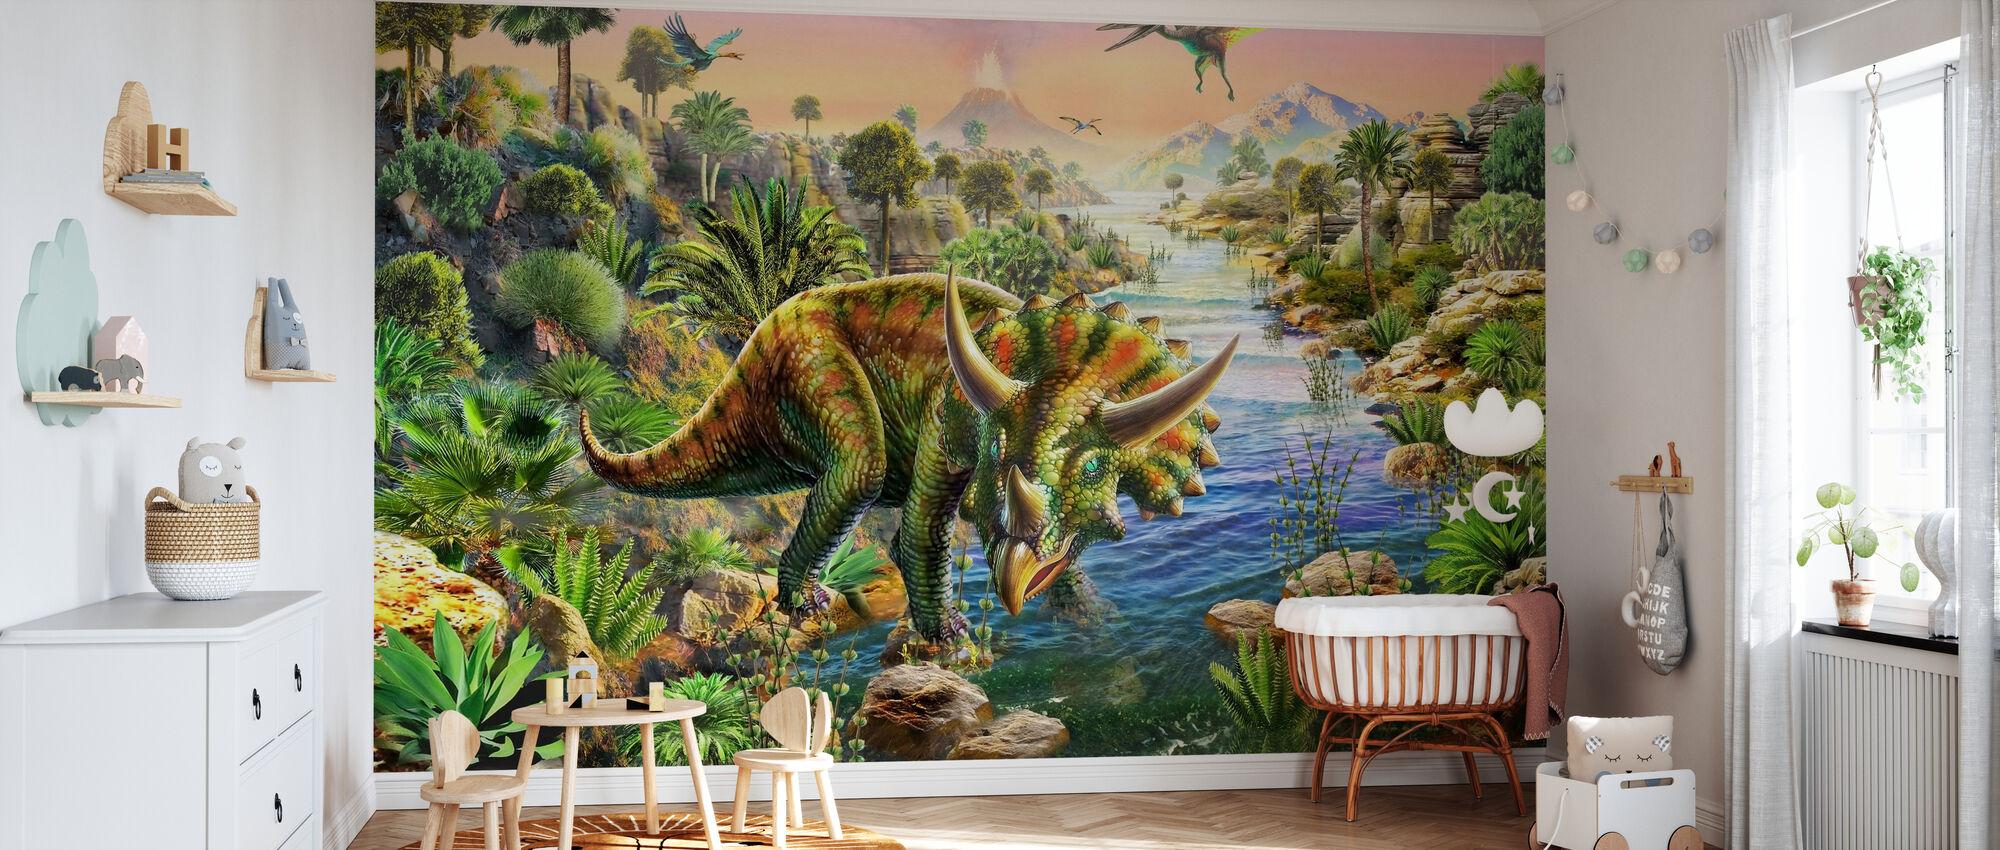 Triceratops - Tapet - Babyrom